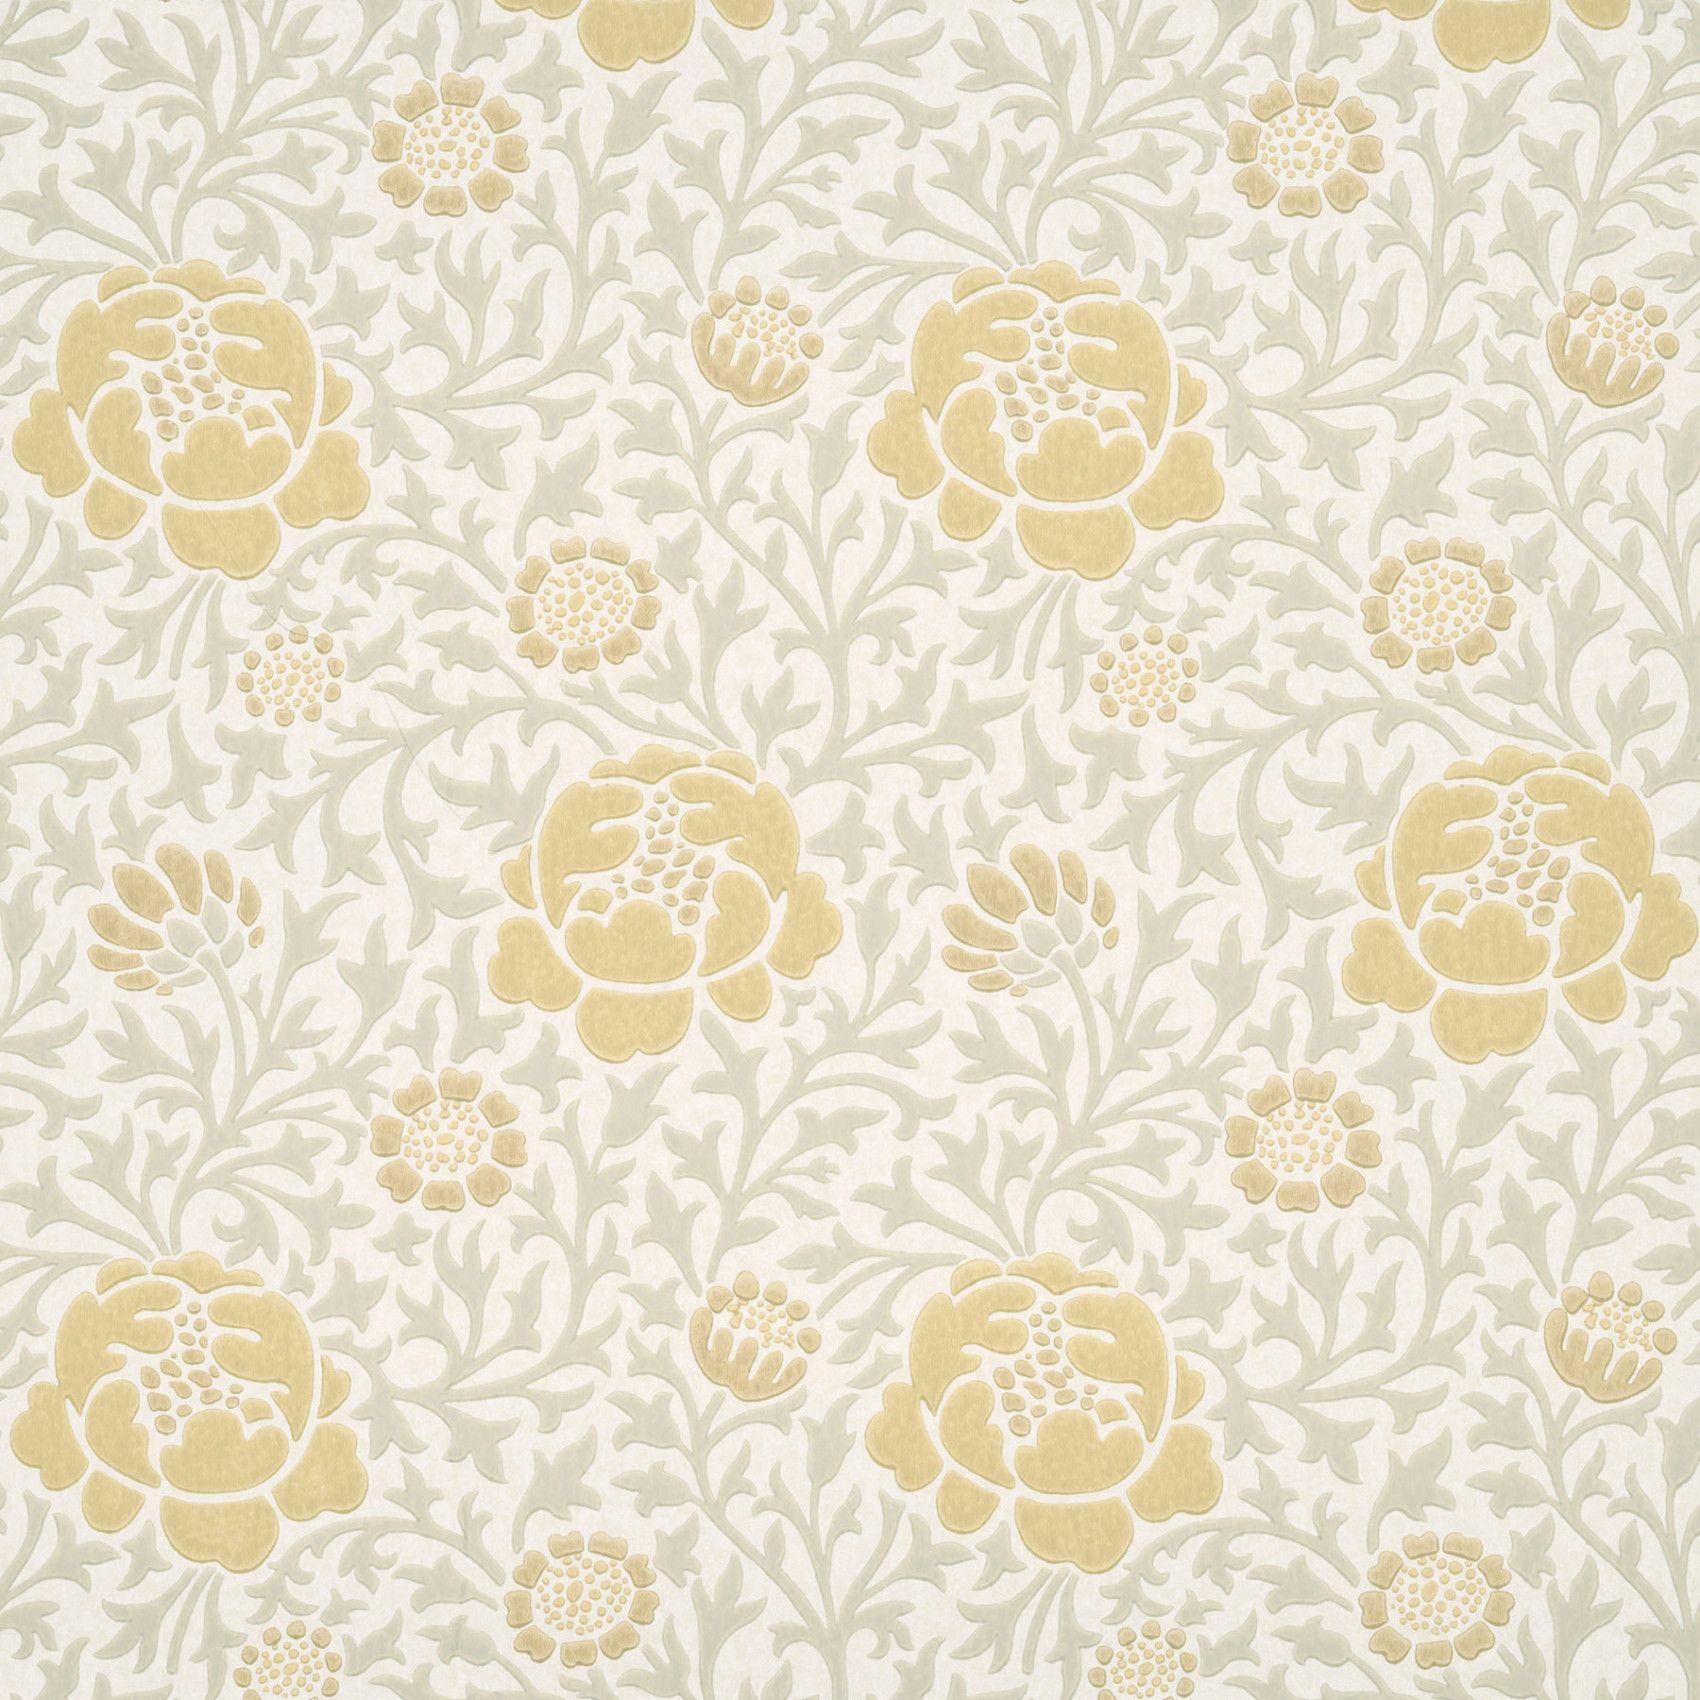 Buy Lansdowne Walk Mist Floral Wallpaper Little Greene